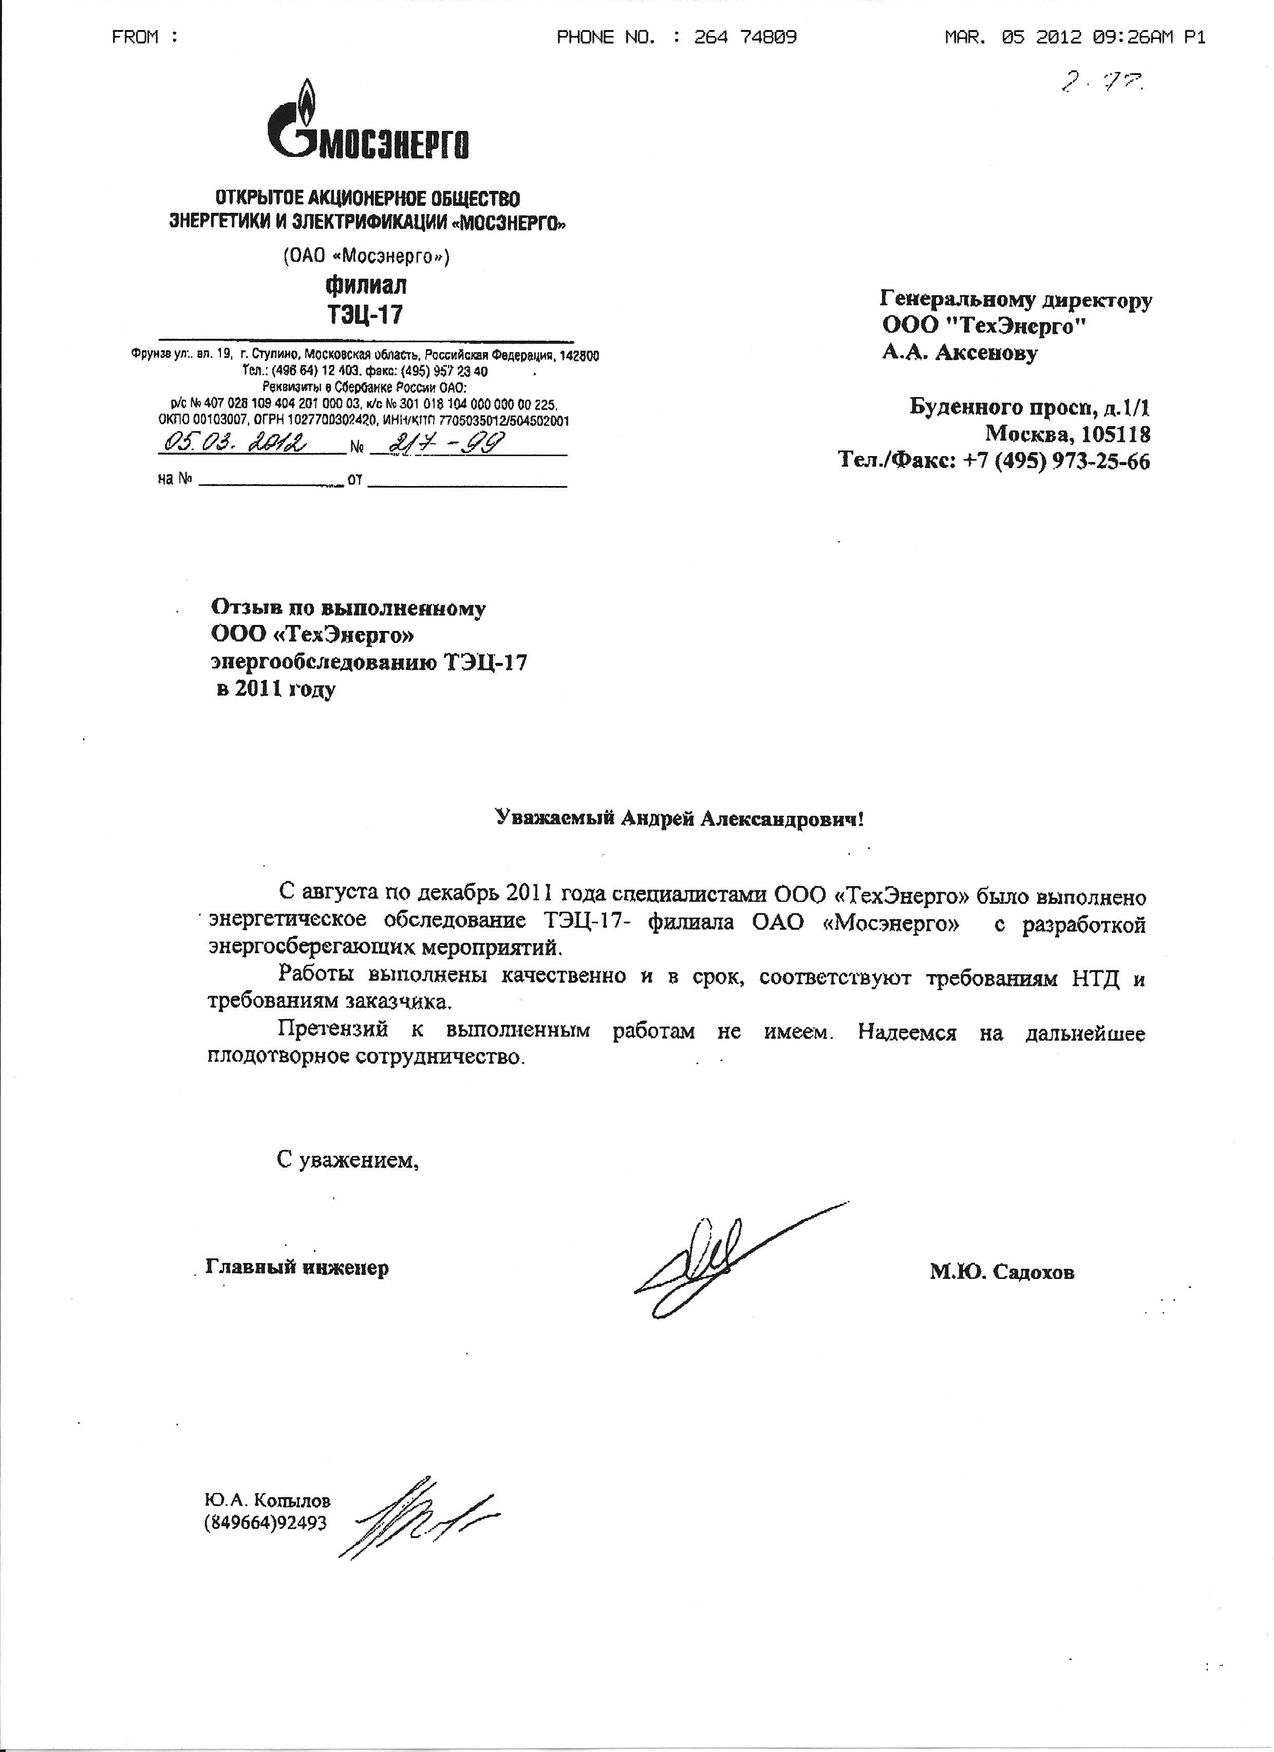 ТЭЦ-17 Энергоаудит 2012.jpg